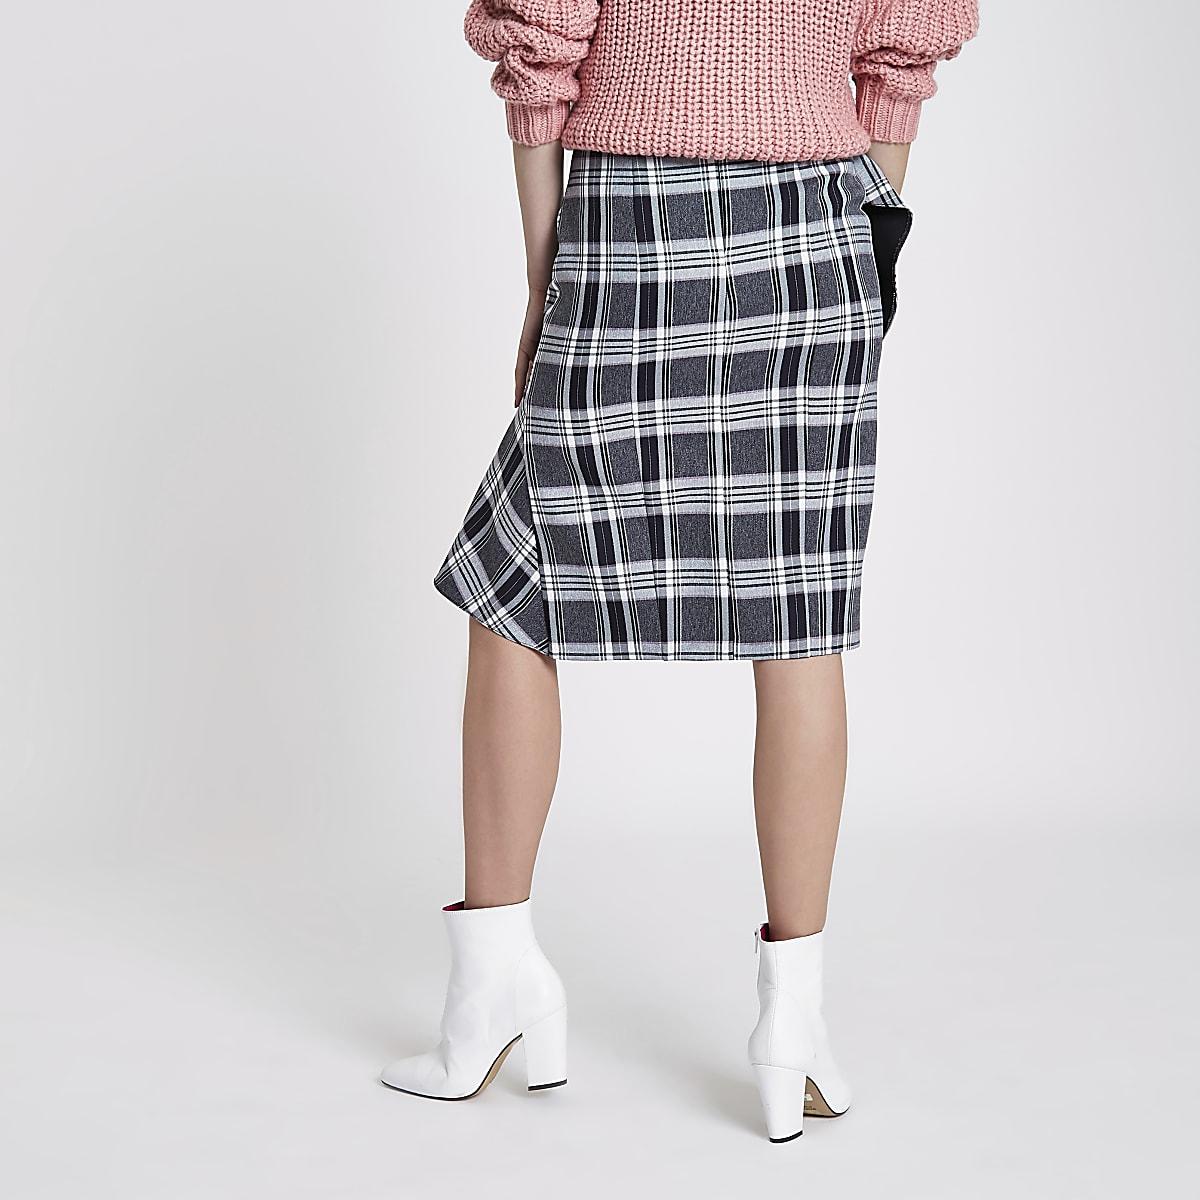 77a7f71278 Navy check asymmetric frill pencil skirt - Midi Skirts - Skirts - women